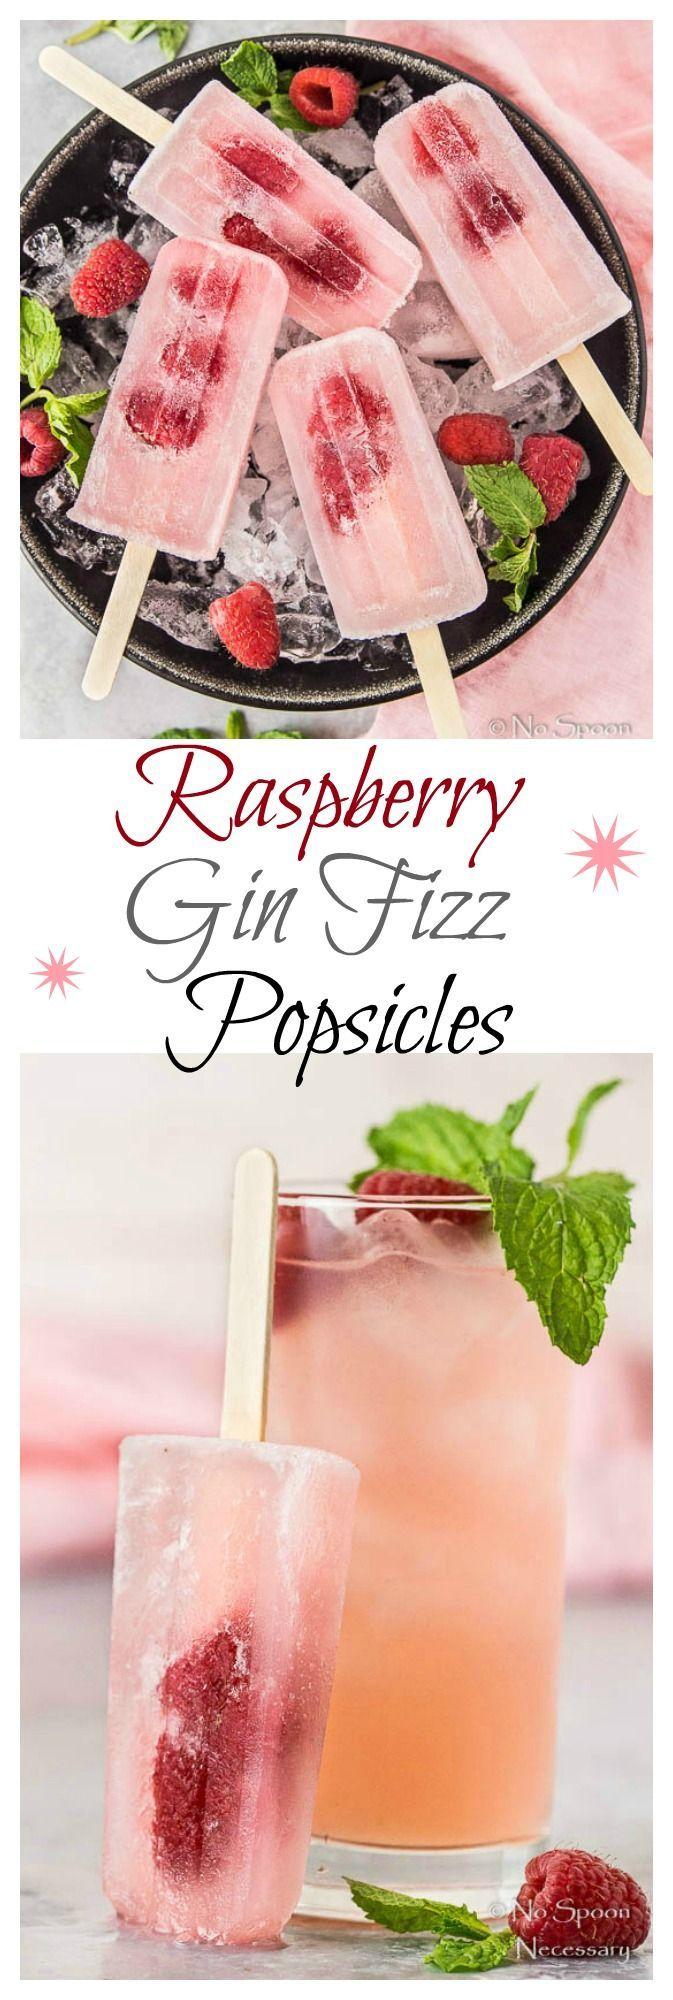 Raspberry Gin Fizz Popsicles.